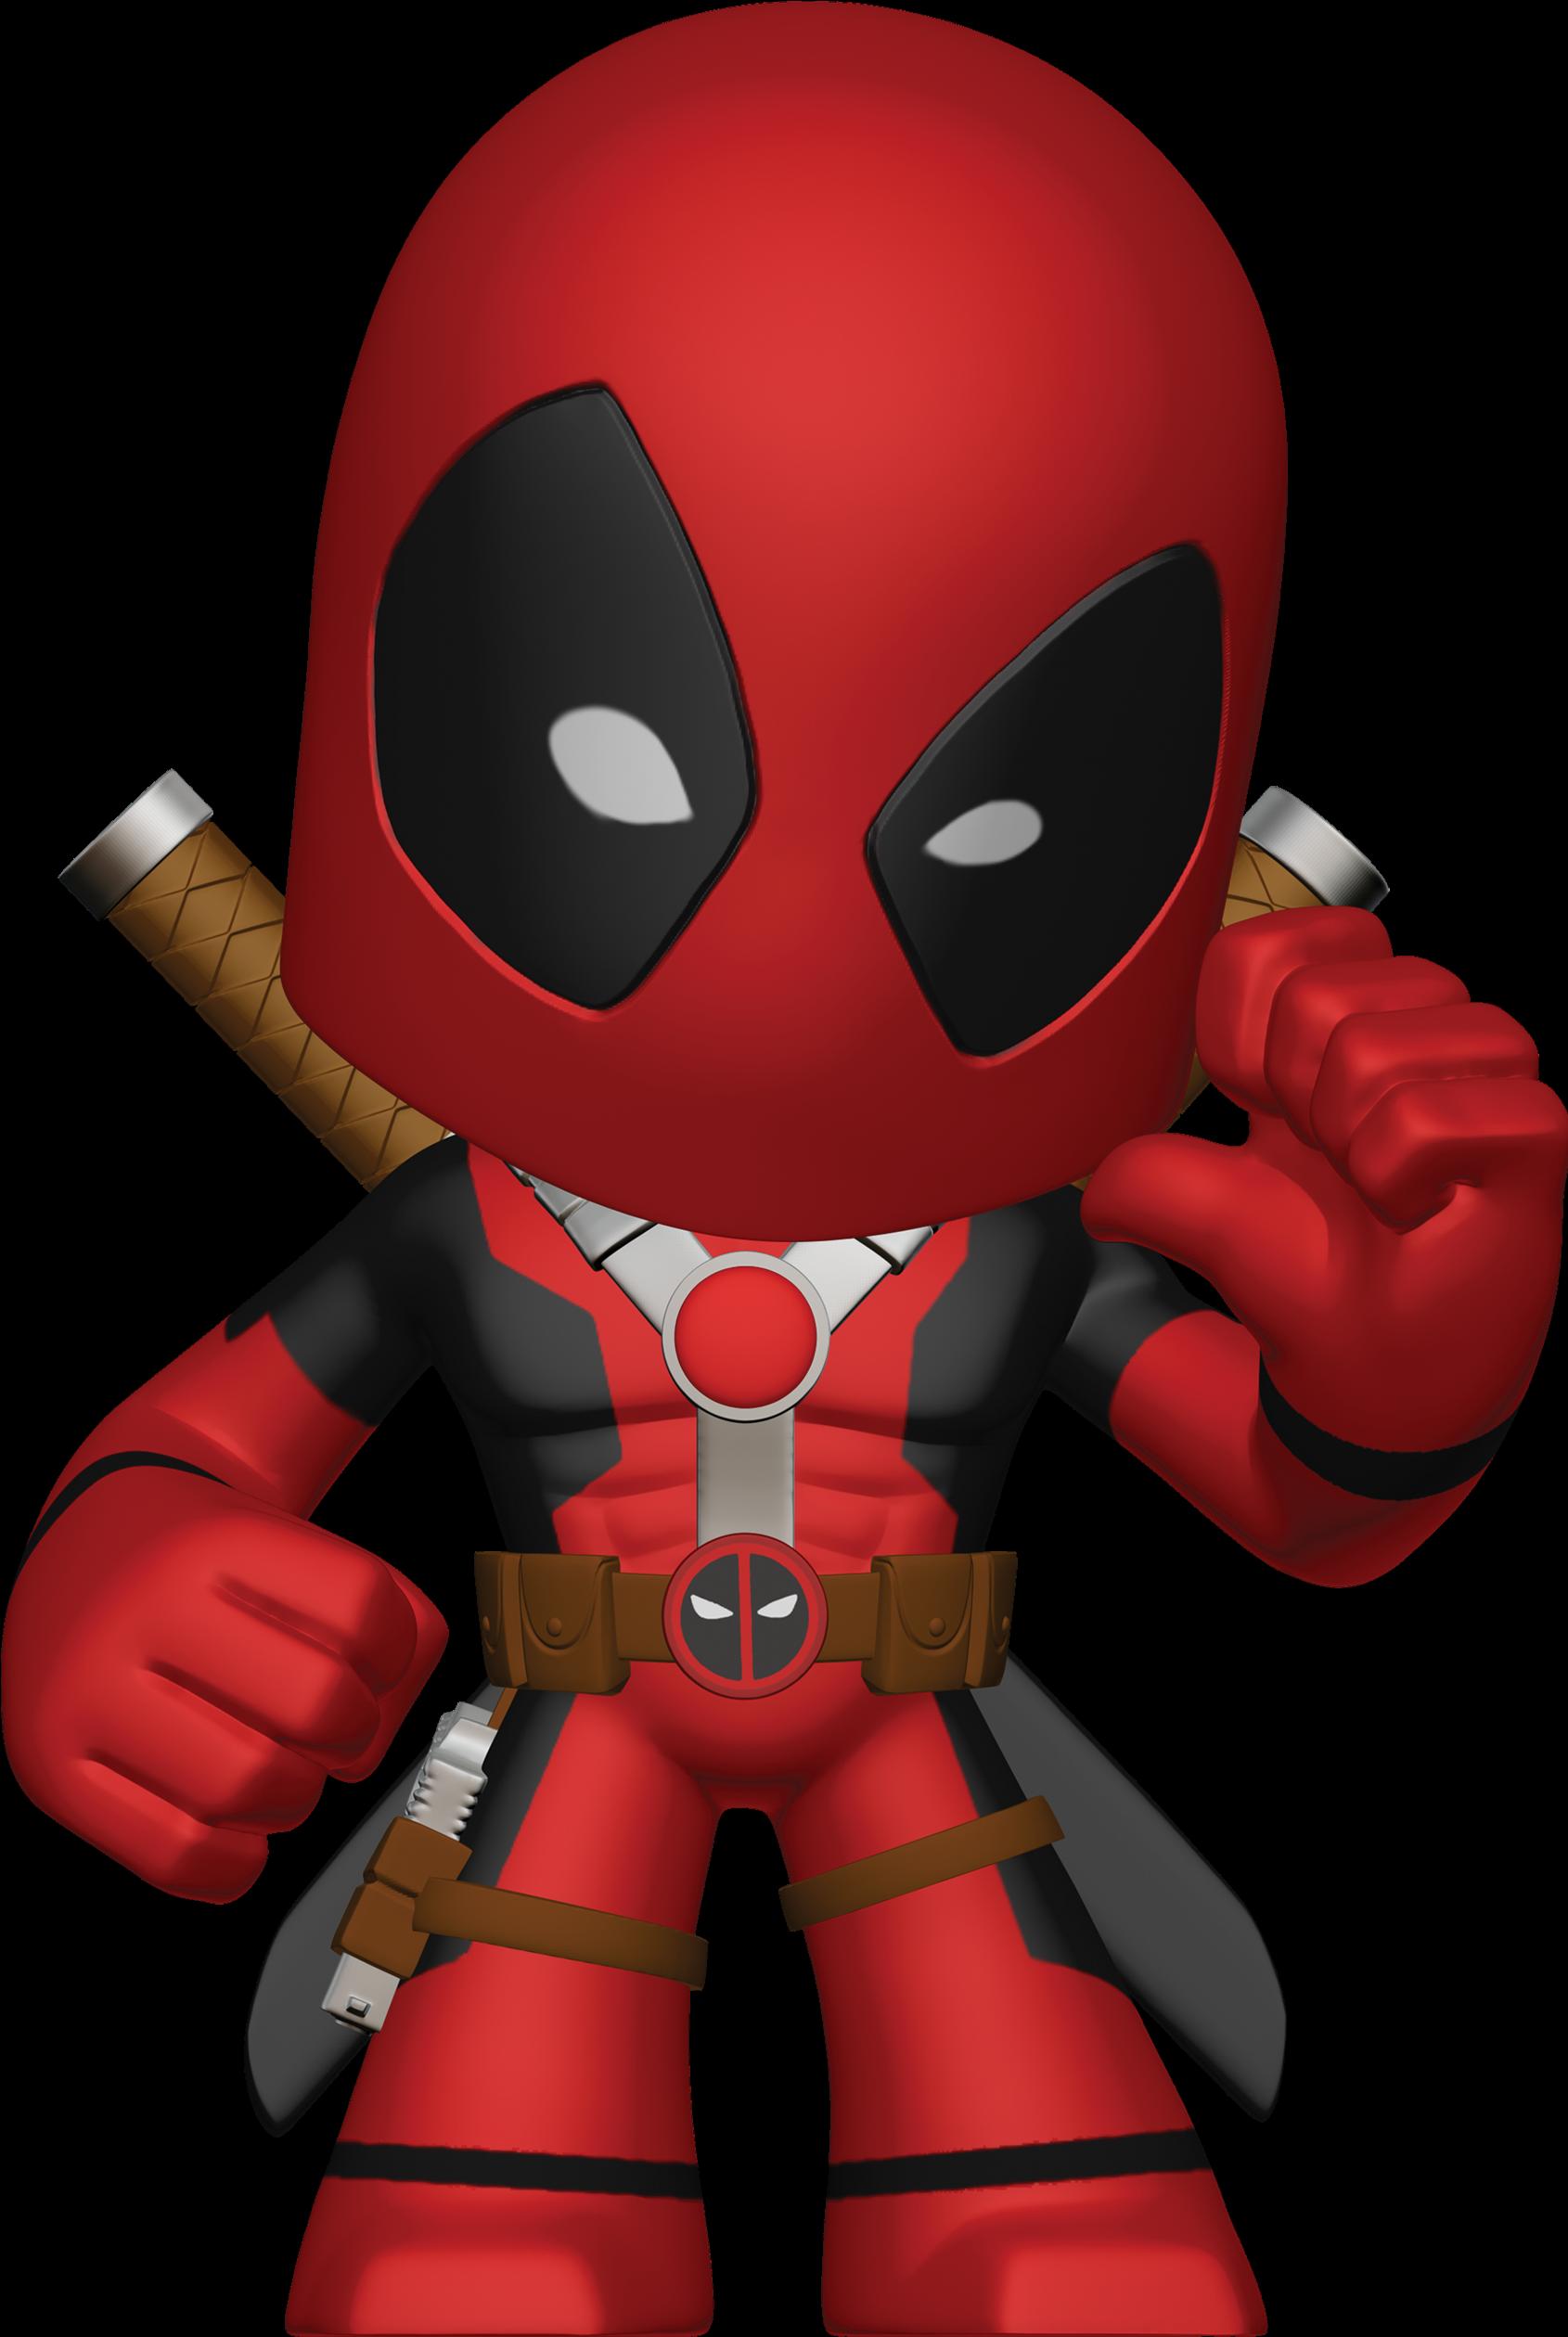 Deadpool Clip Firefly Cartoon Figure Of Deadpool Png Download Full Size Clipart 4131320 Pinclipart